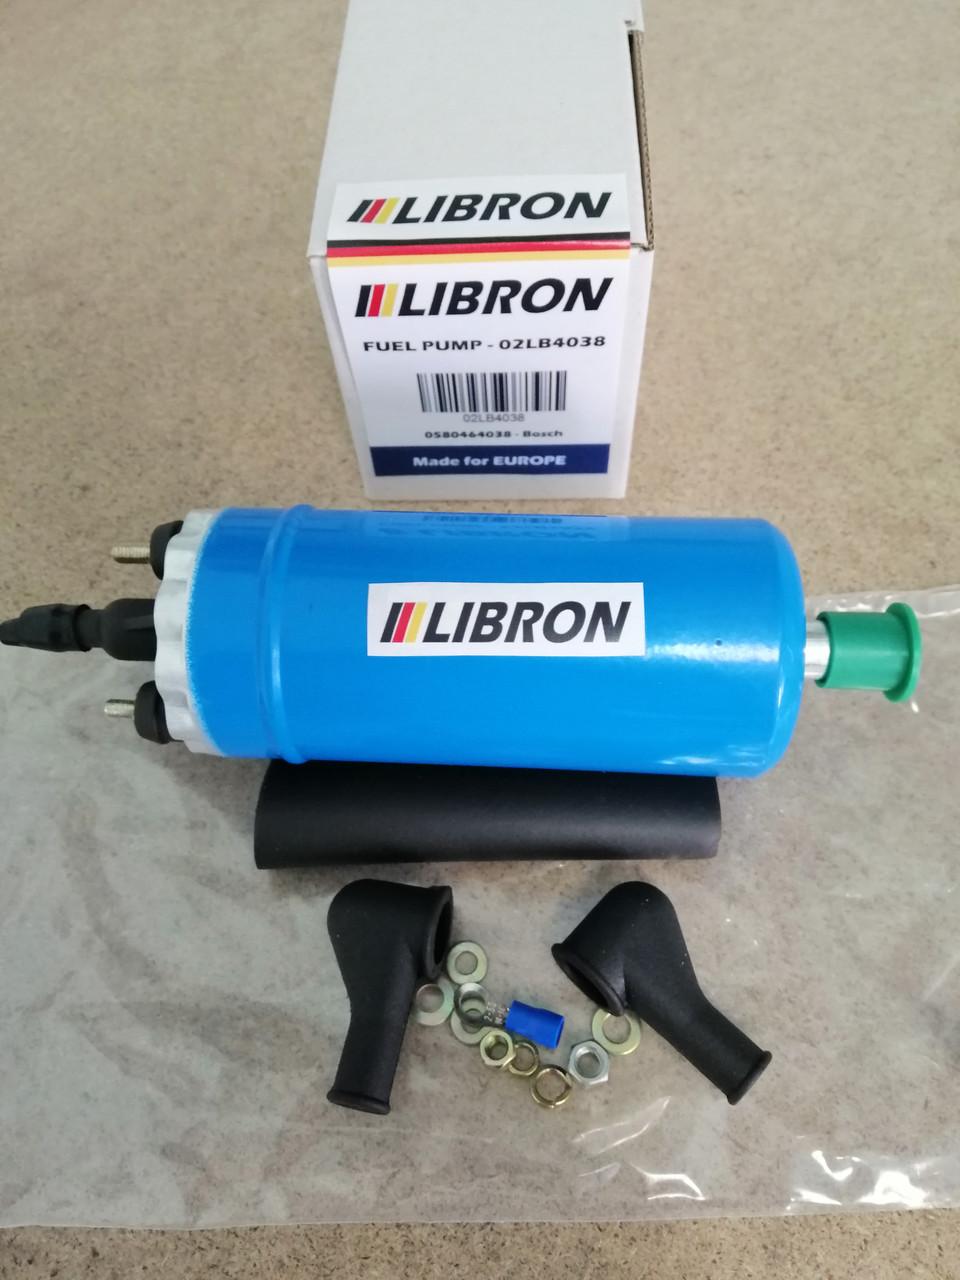 Бензонасос LIBRON 02LB4038 - Рено Еспейс I (J11_) 2.0 i Quadra (J116) (1988-1992)